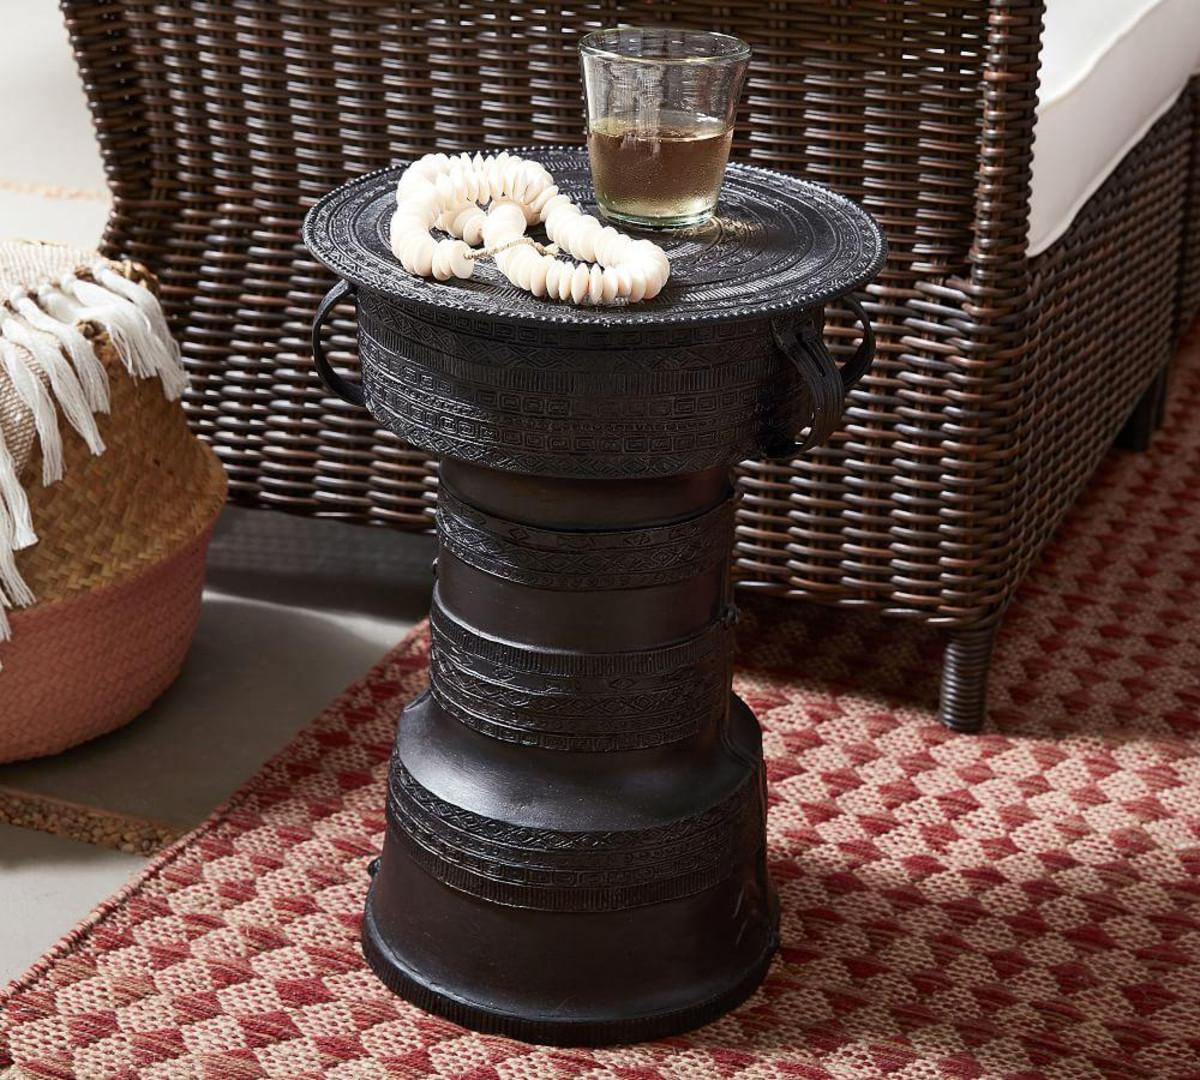 frog drum accent tables pottery barn media table furniture dining signature bedroom oak wood side kitchen sideboard antique bedside pulls slide under sofa ikea crystal lamps